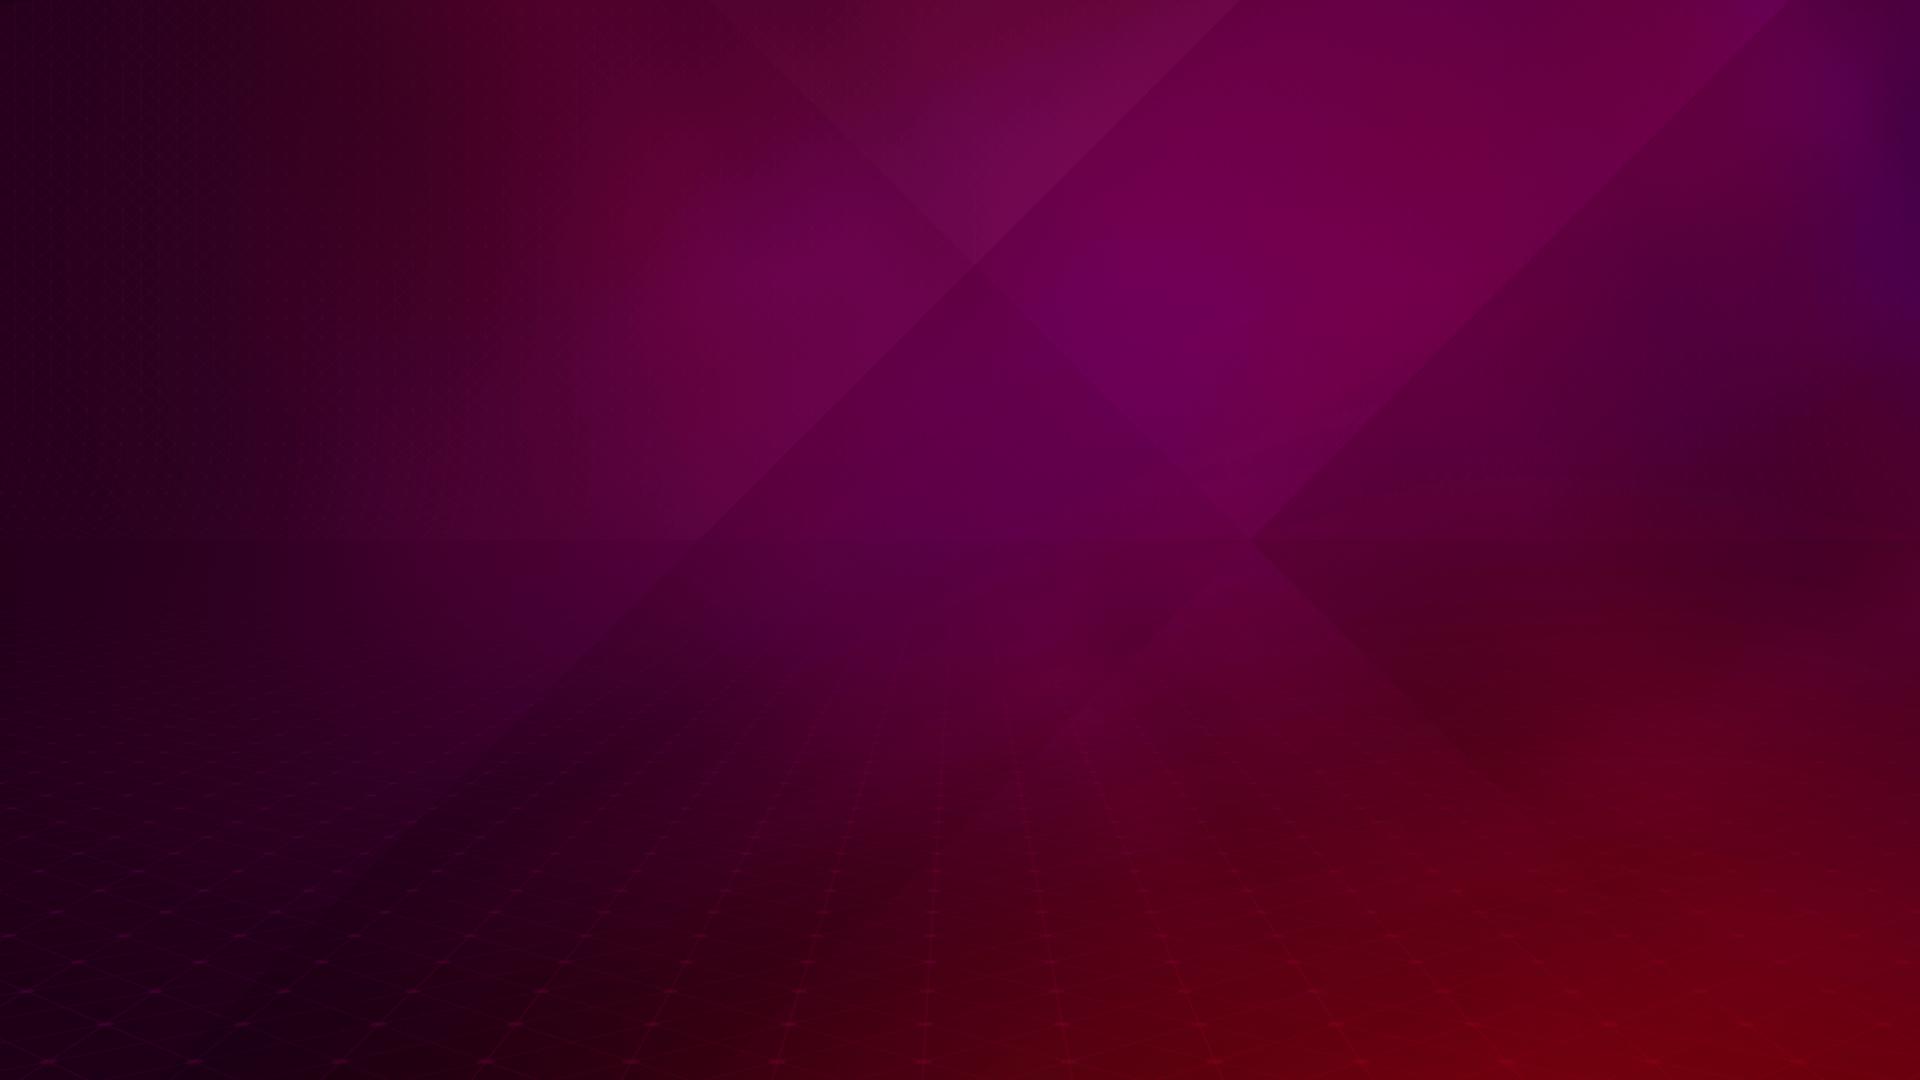 Ubuntu Web Design